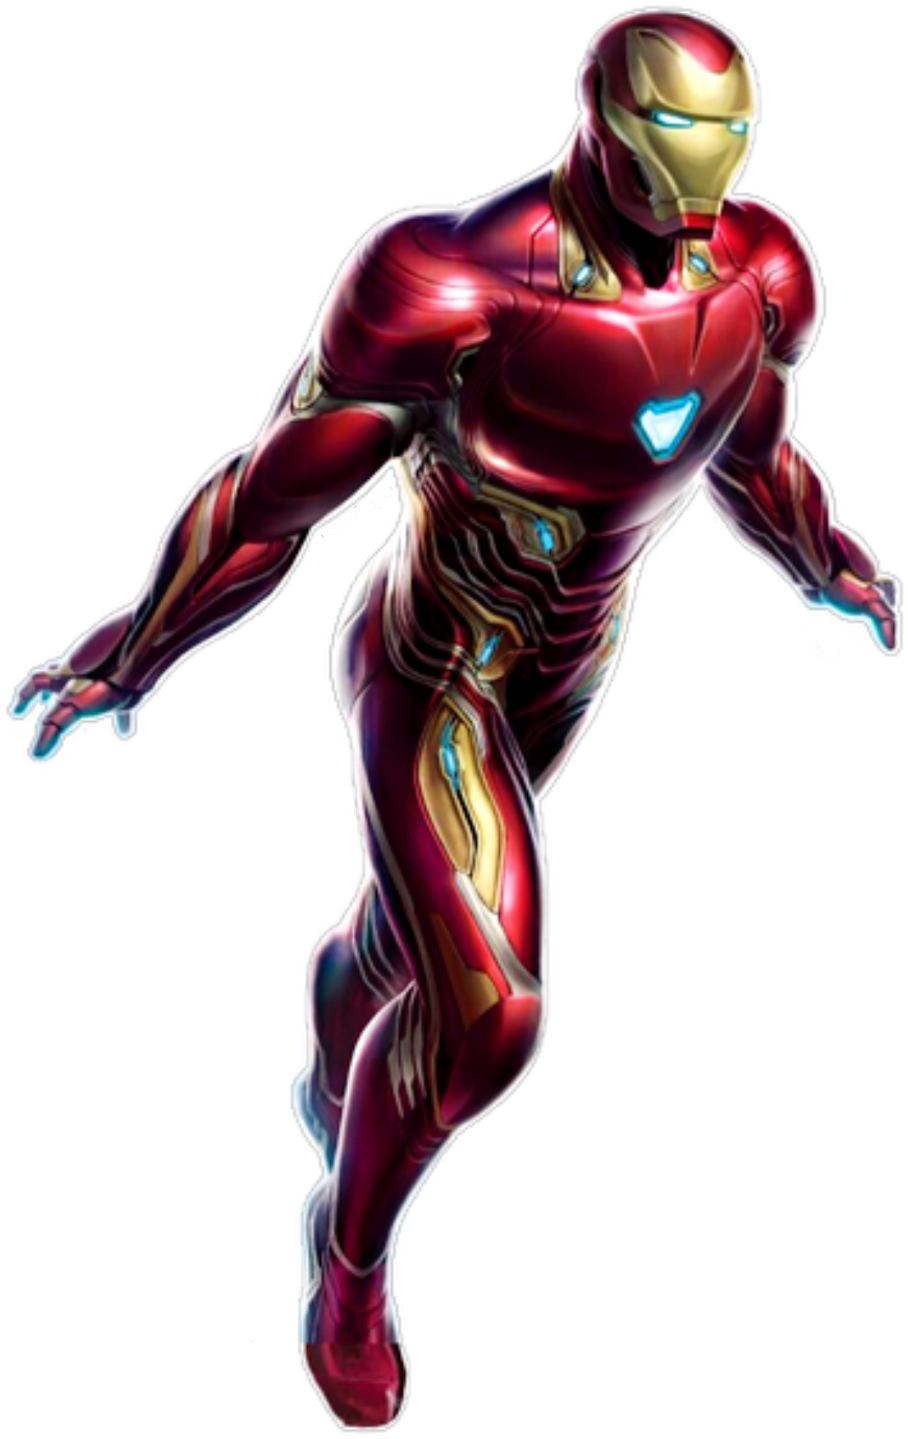 Transparent ironman clip art - #ironman #tonystark #avengers #endgame #marvel #mcu - Avengers 4 Concept Art Iron Man